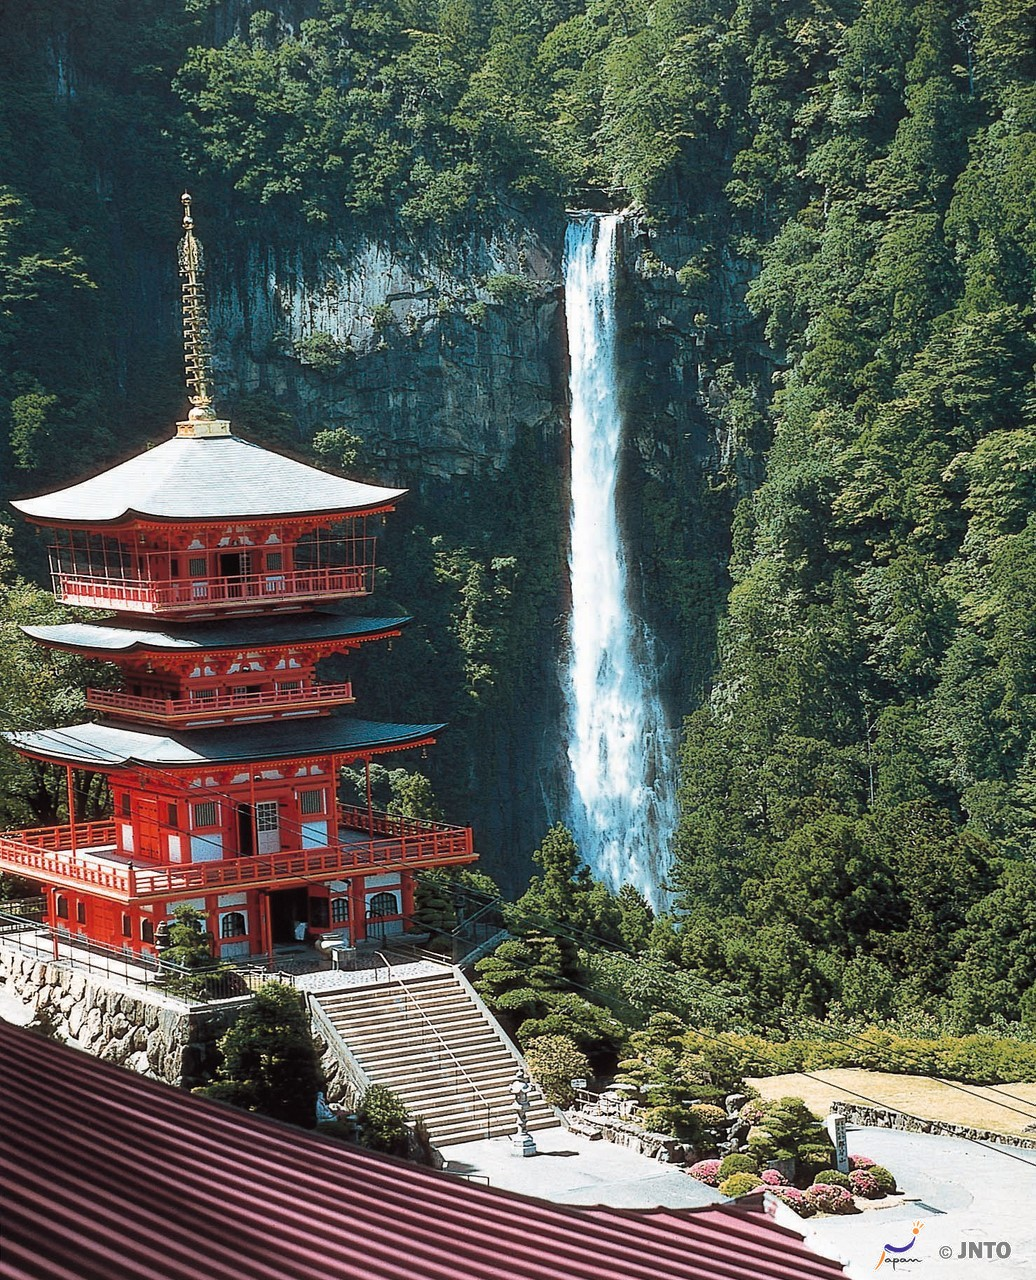 Kii peninsula access guide. How to get Shirahama, Kii-Katsuura and Shingu.